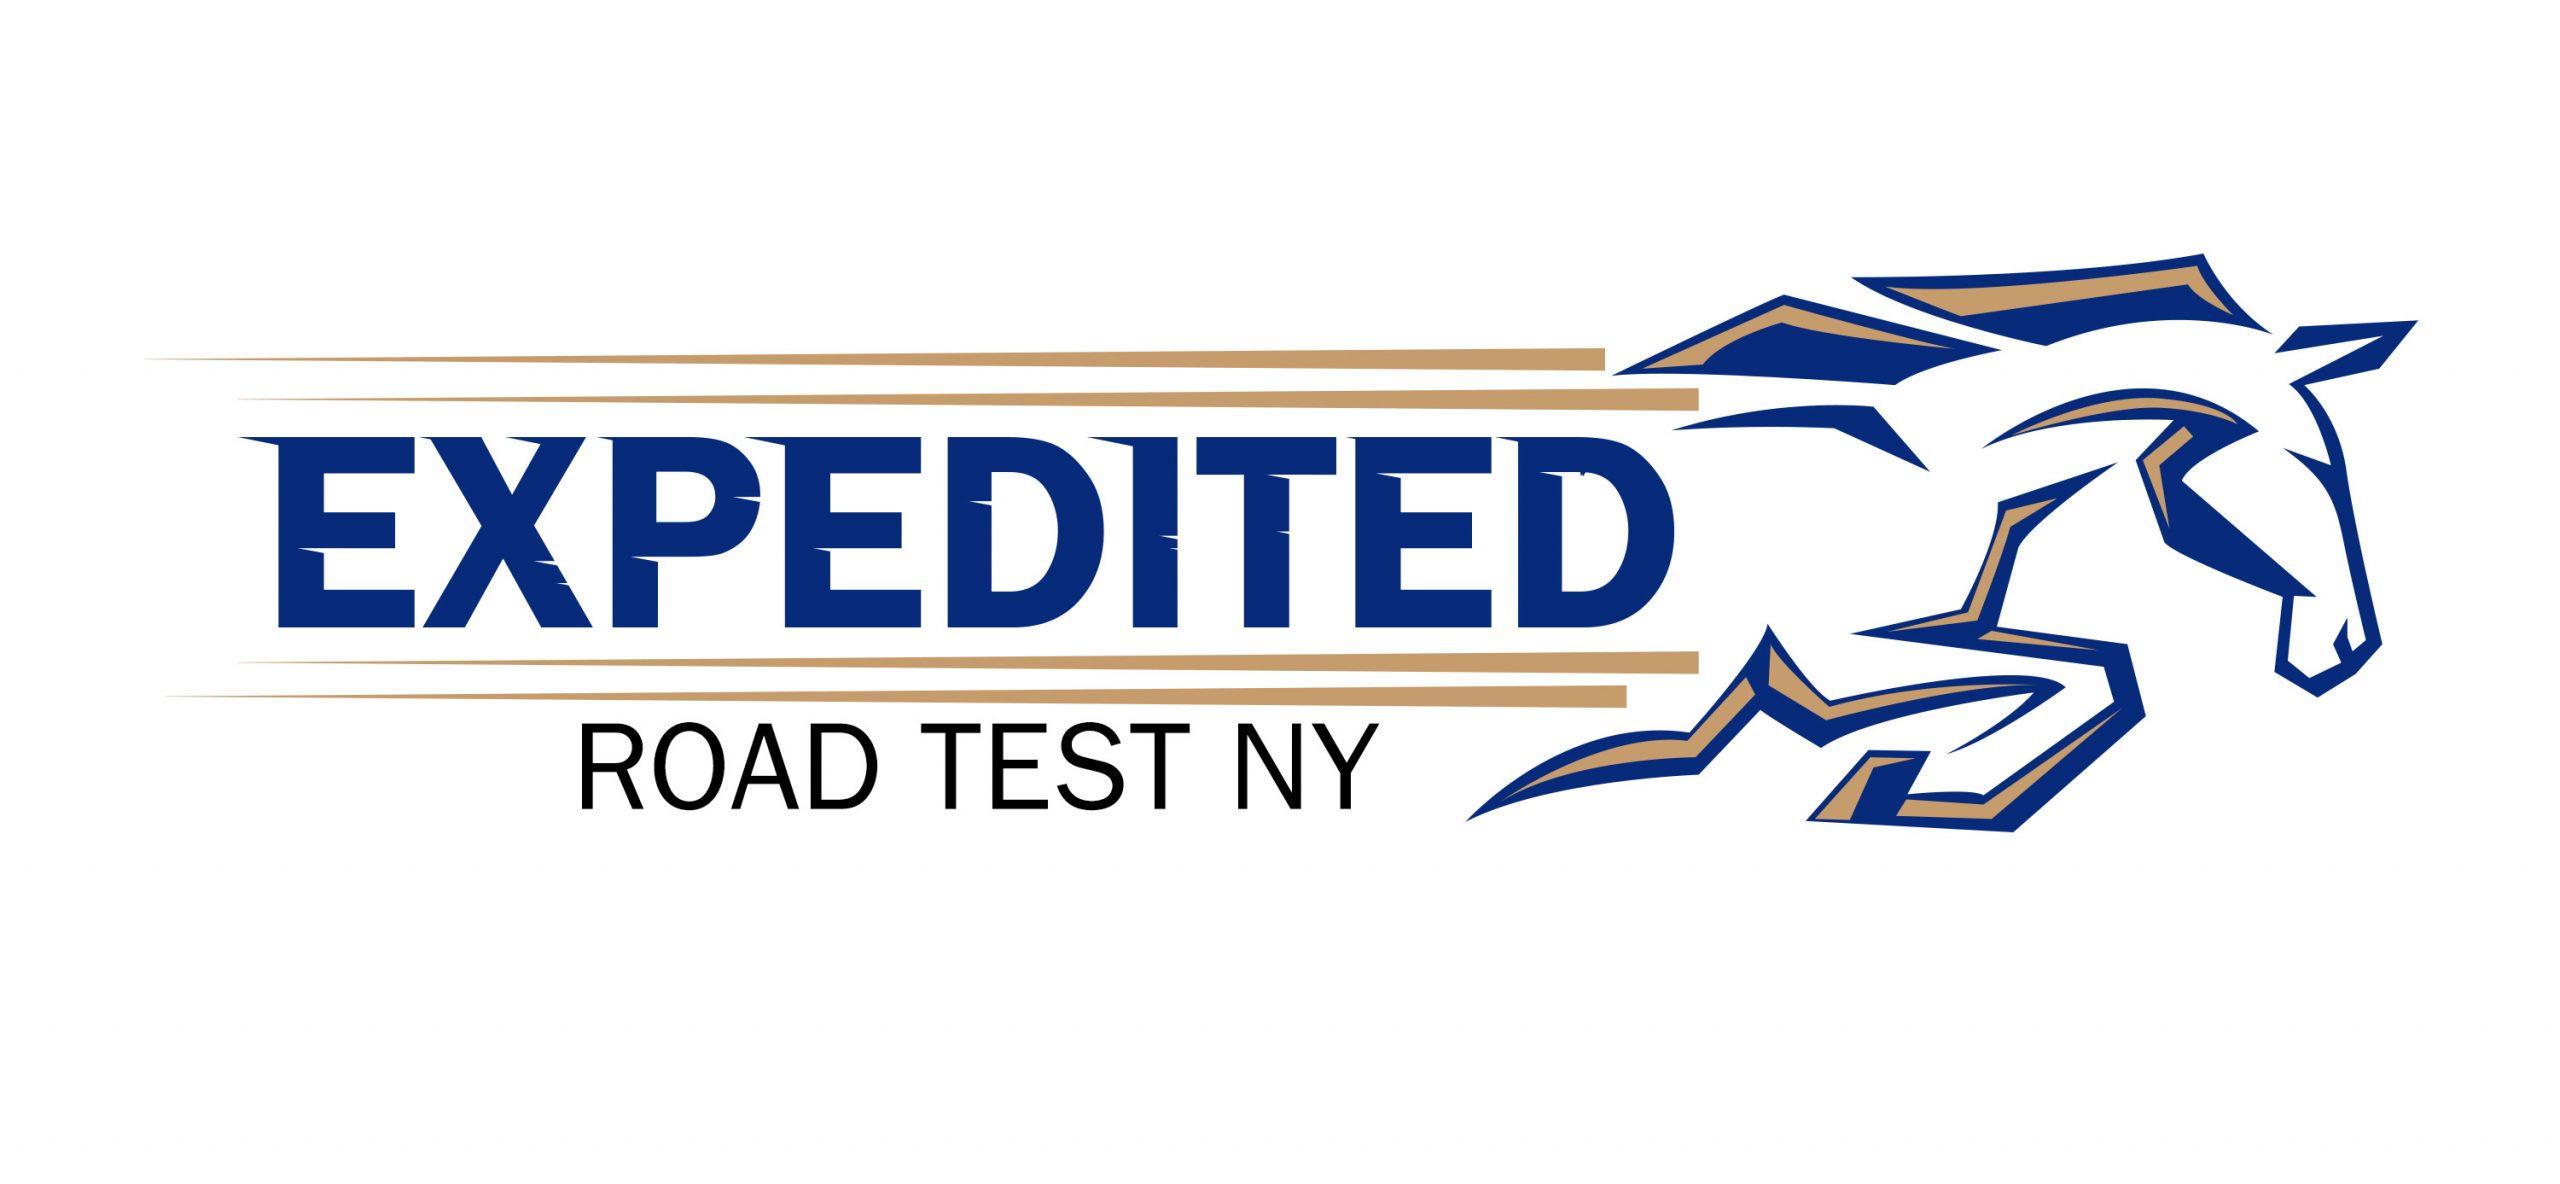 Expedited Road Test NY